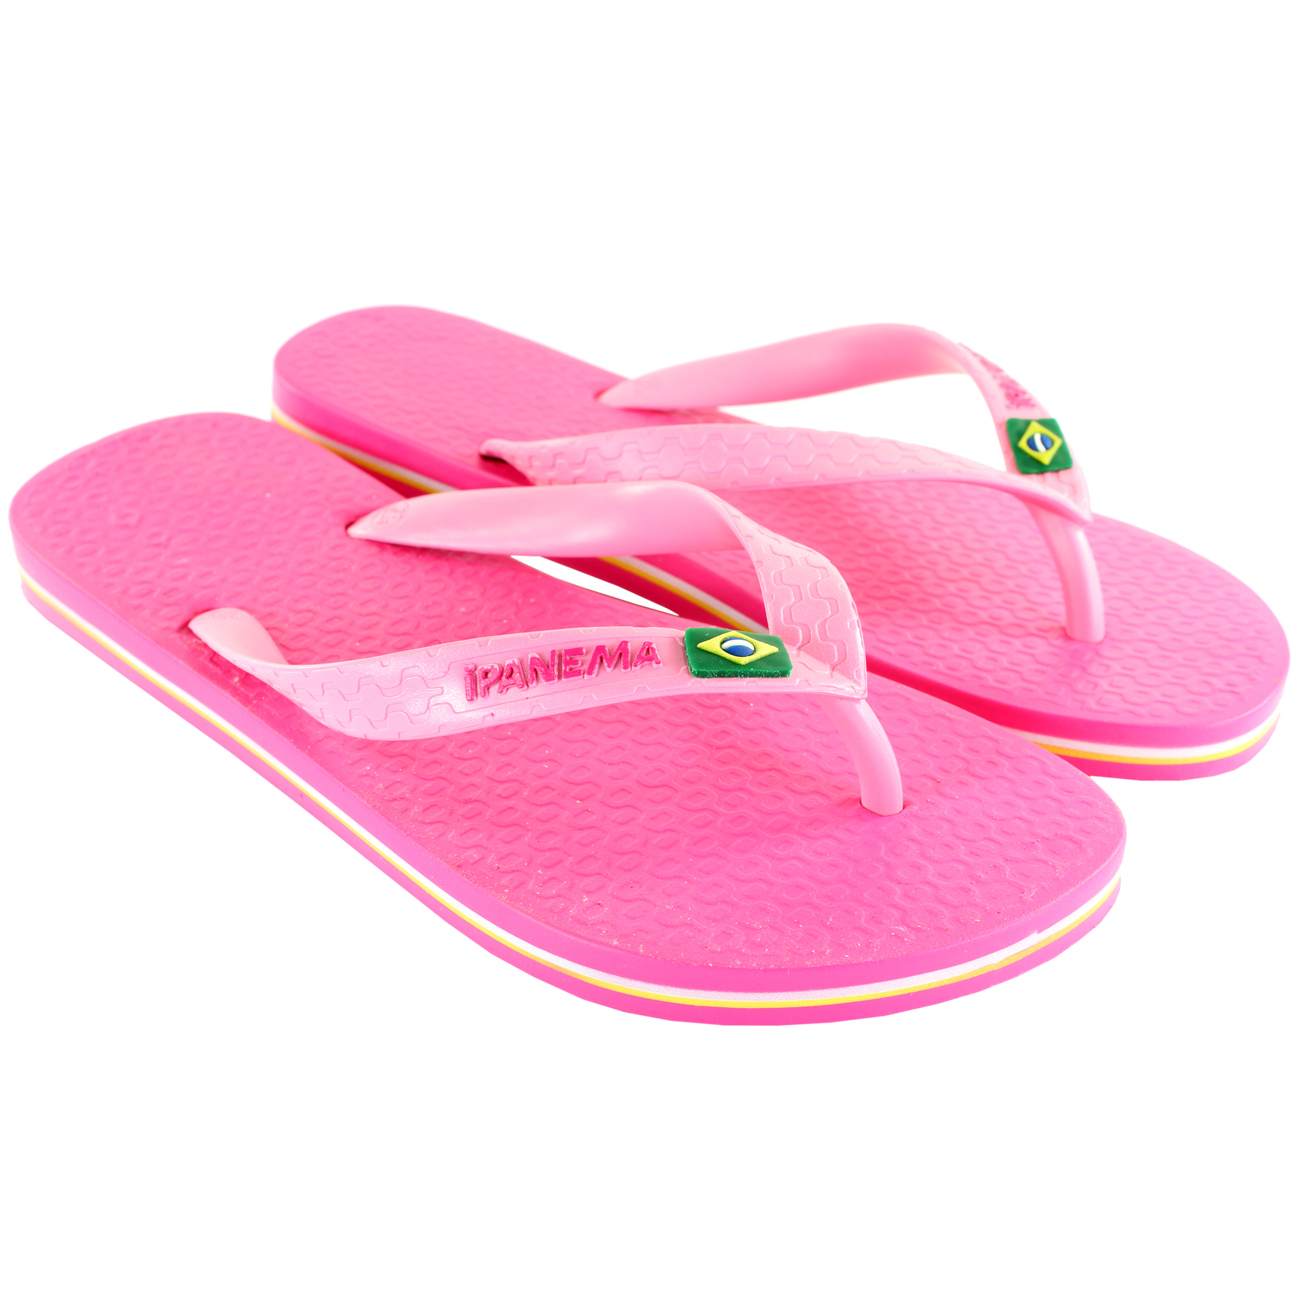 iPANEMA Brazil Flip Flops